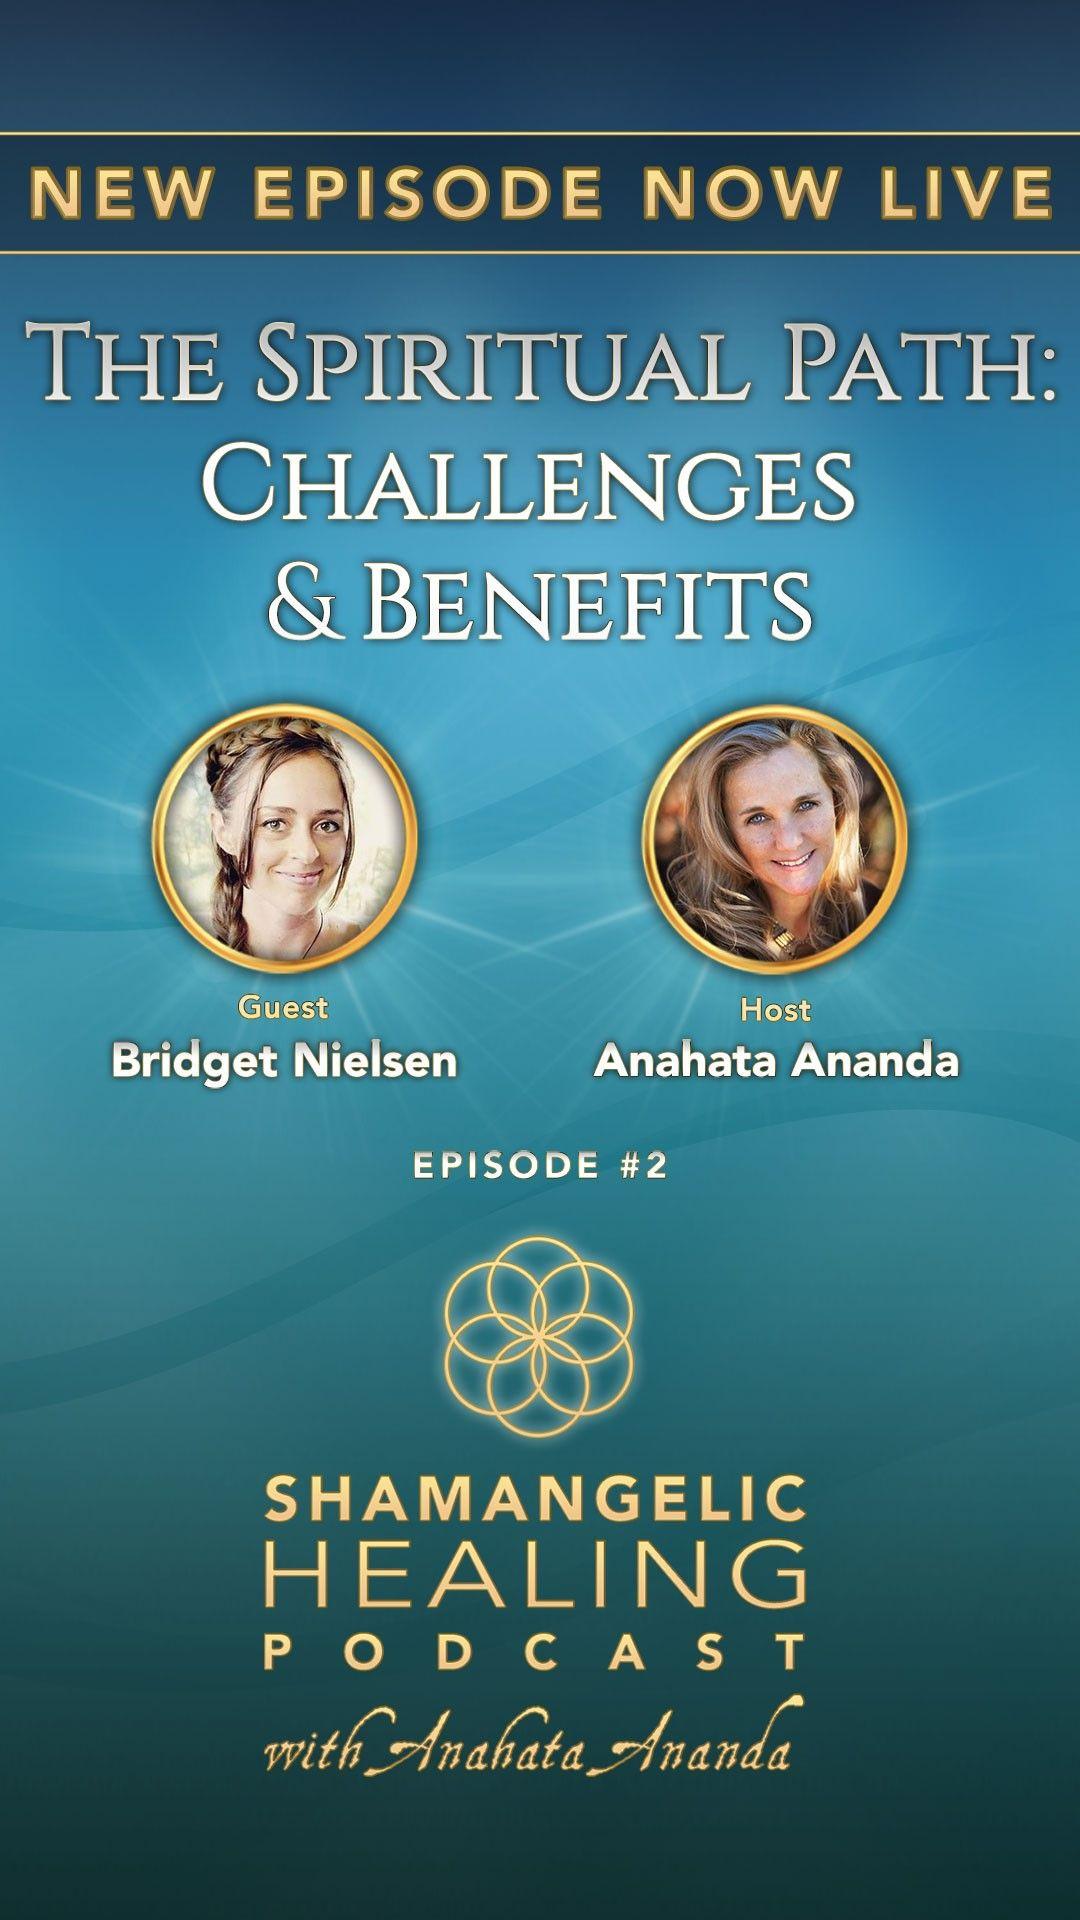 SHAMANGELIC HEALING PODCAST hosted by AnahataAnanda